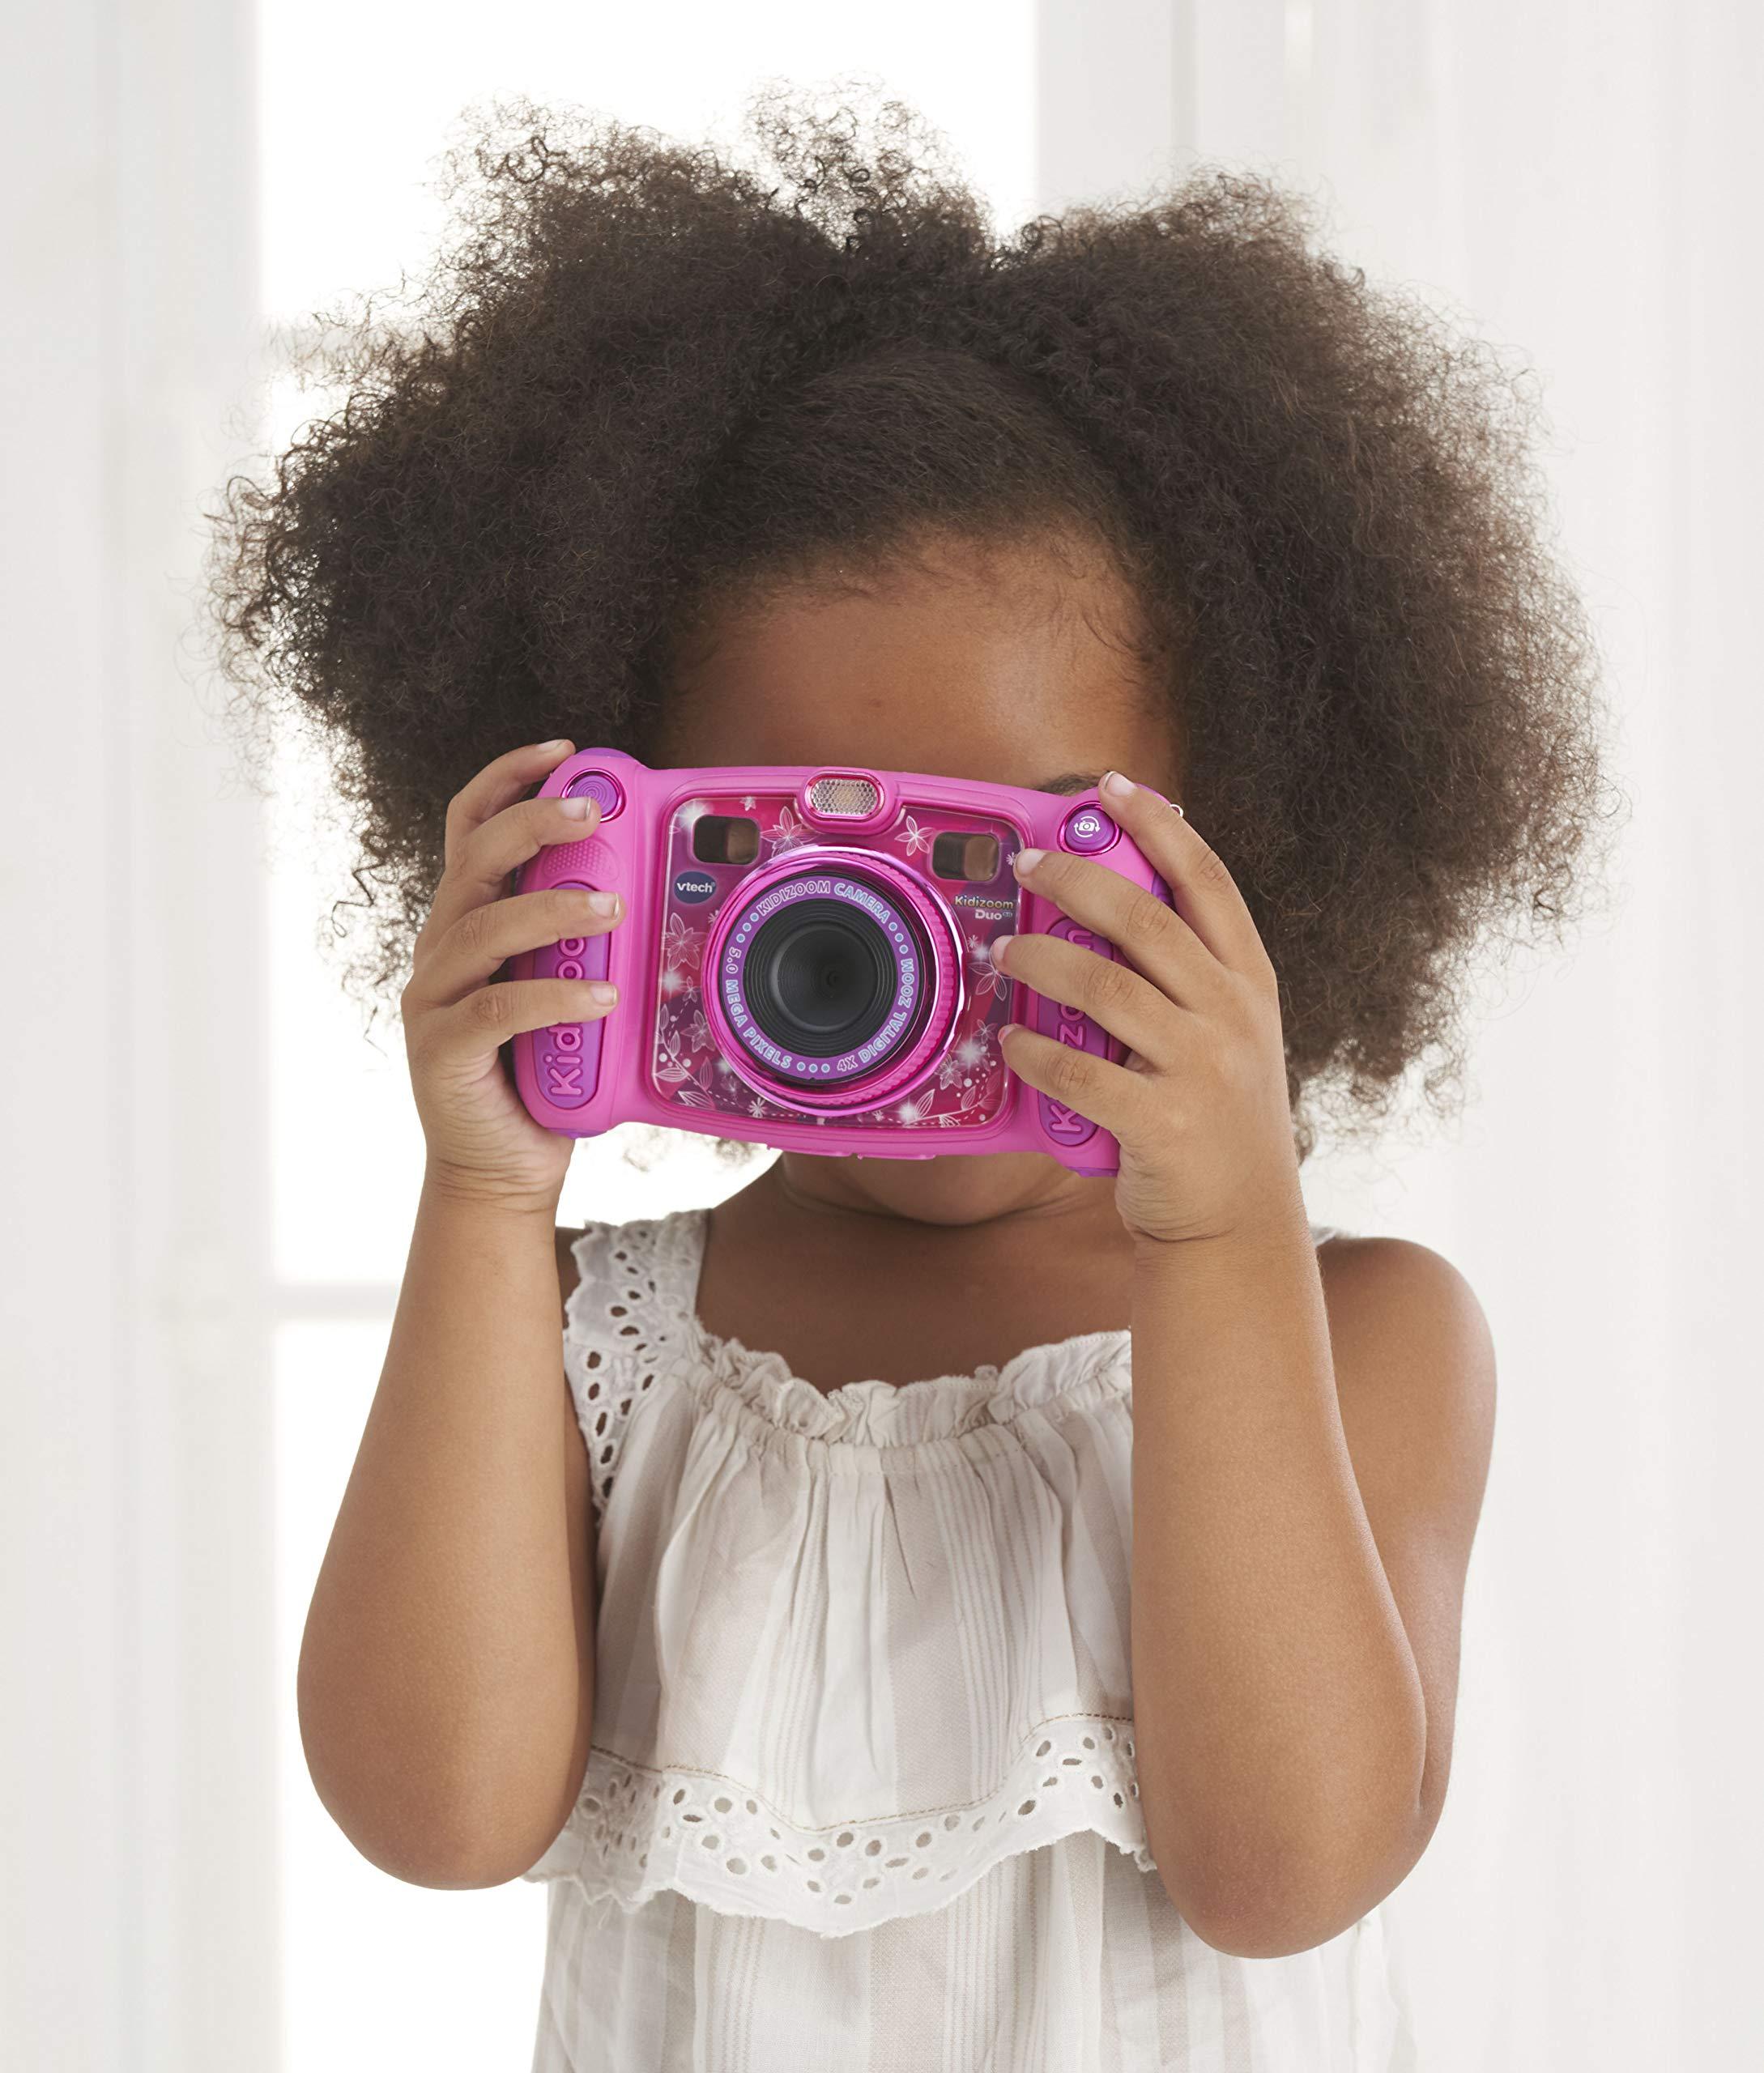 VTech Kidizoom Duo 5.0 Camera Pink by VTech (Image #8)